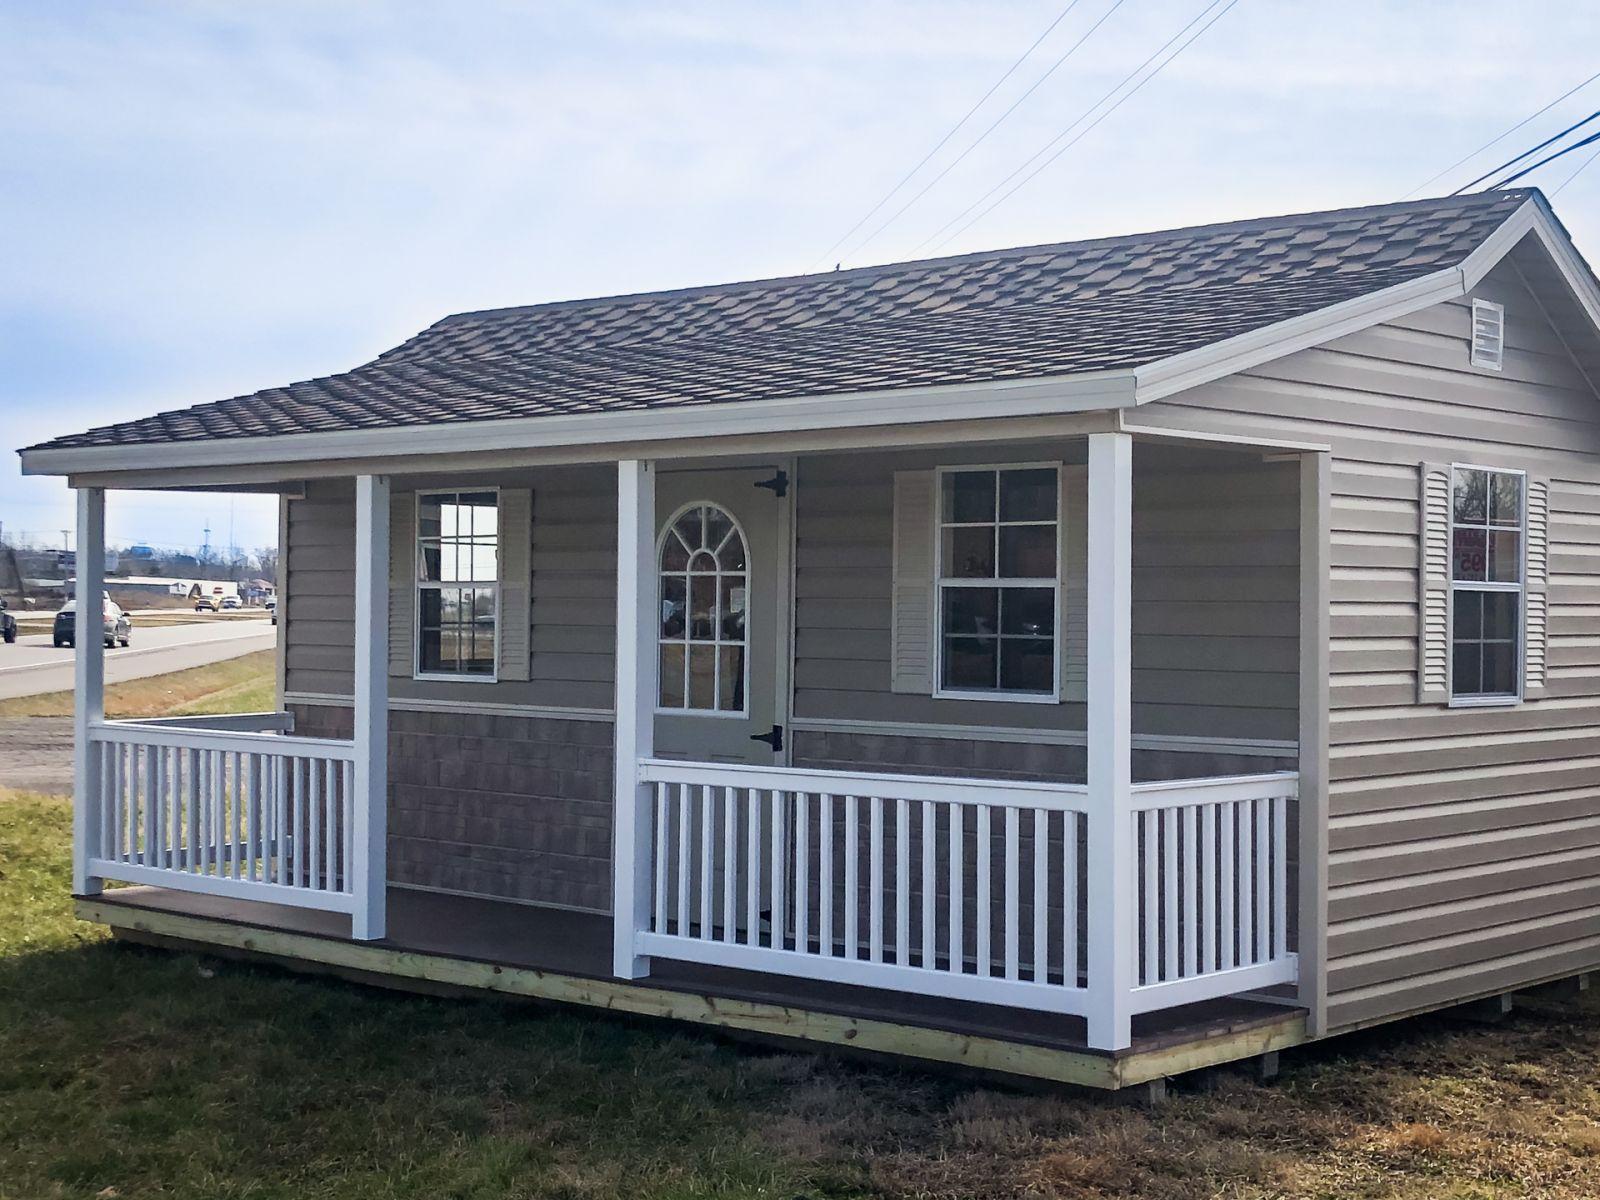 A prefab cabin shed for sale in Louisville, KY